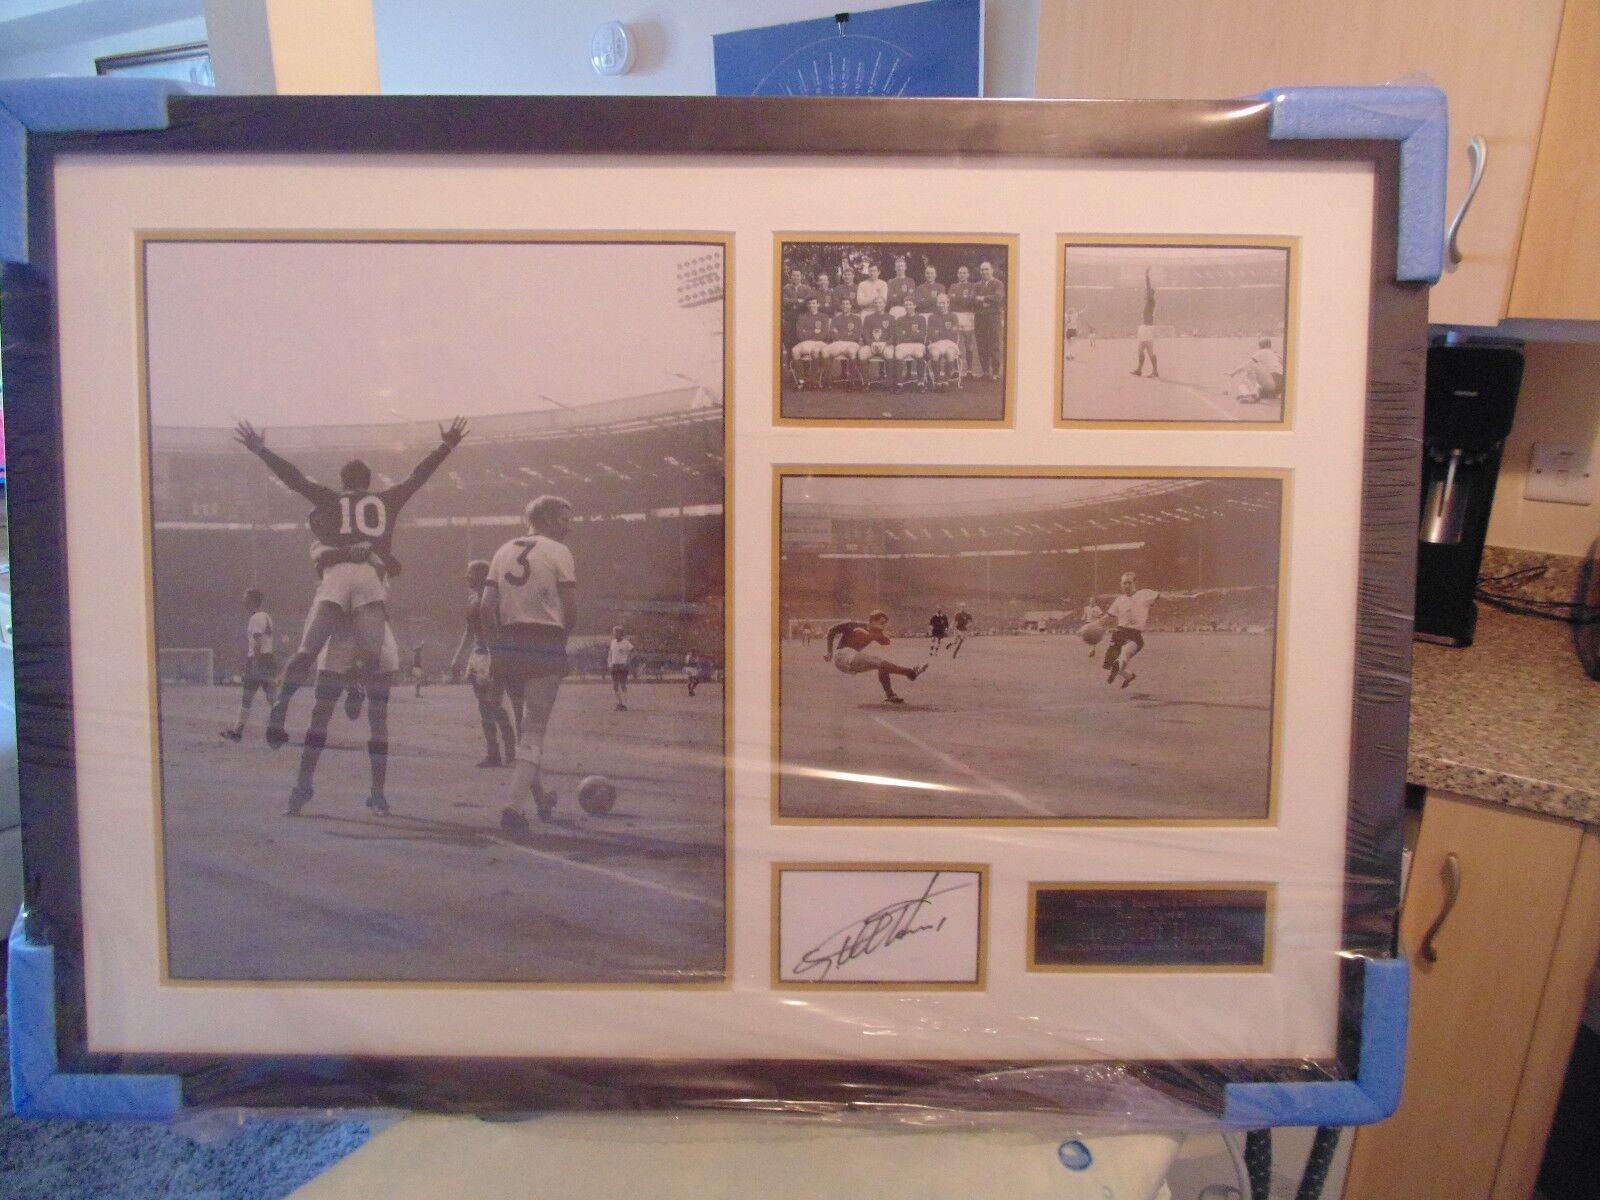 Geoff Hurst Signed World Cup Winner 1966 Wonderland Memorabilia Framed Prints